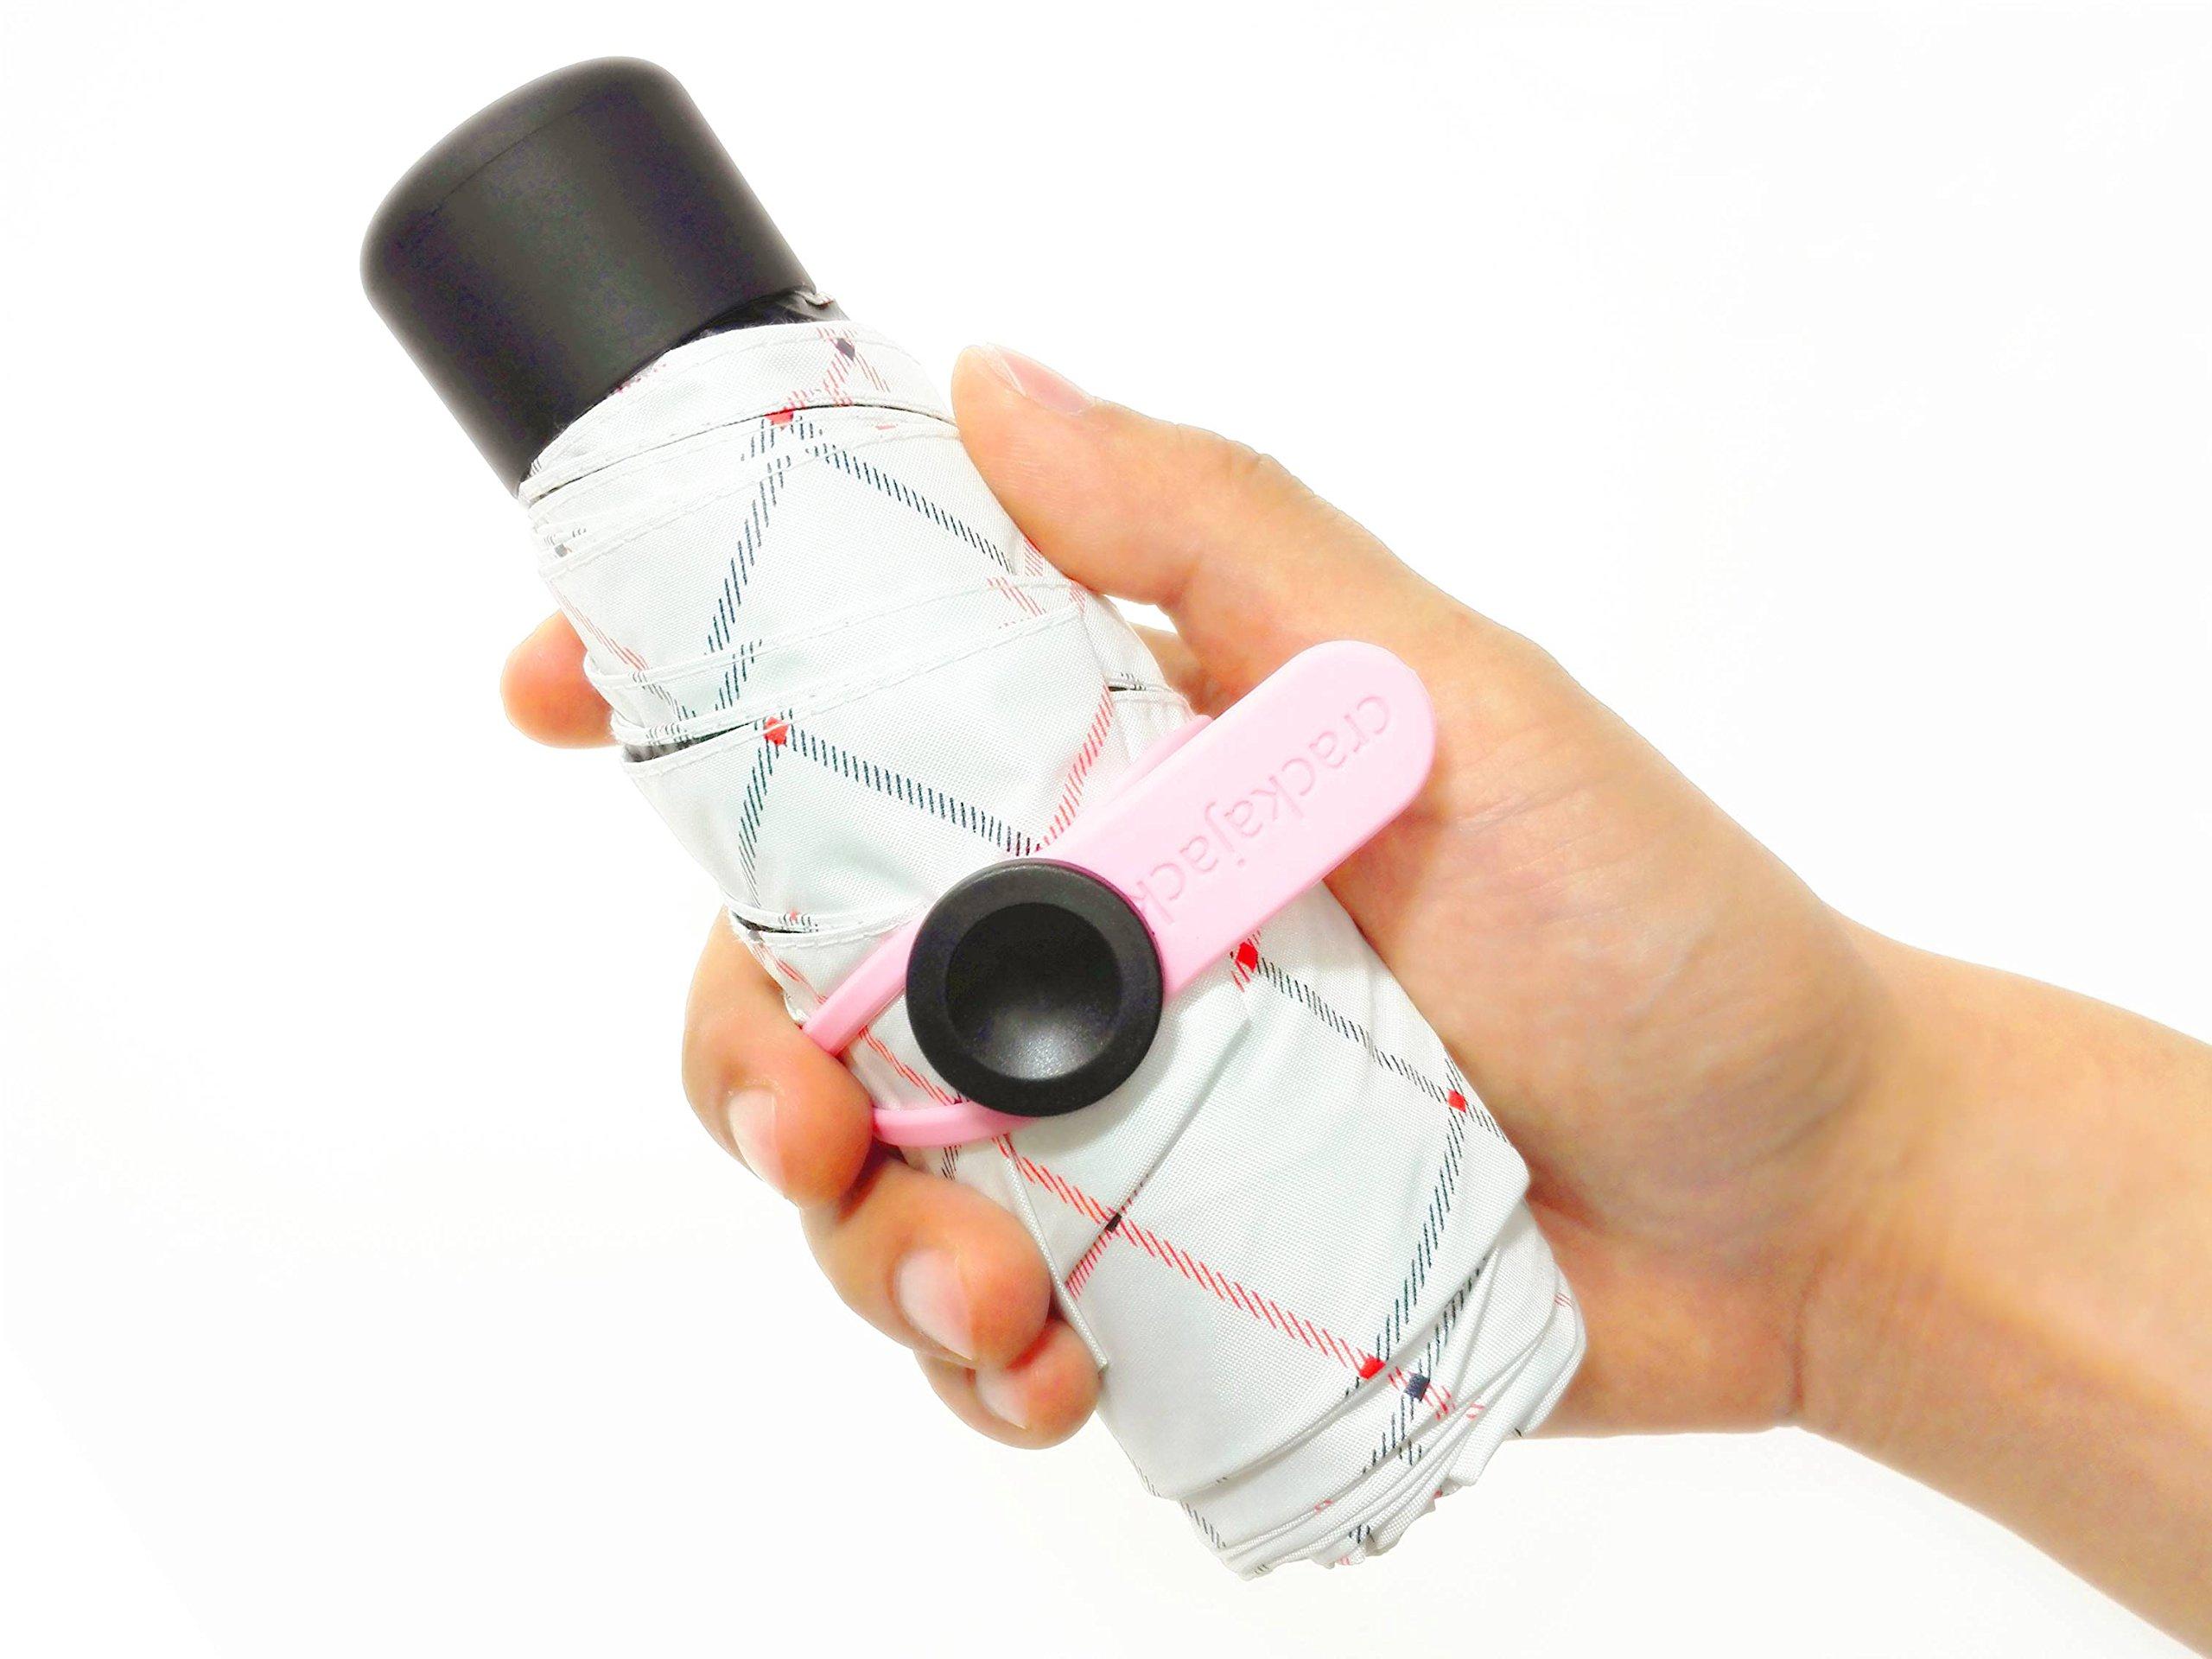 crackajack Ultra Light(7.4oz), Ultra Mini(6.7in), Ultra Protective(95% UV Resistance), Ultra Cool(6 Elaborate Details) Tiny Sun Blocker Umbrella! (black and red lines)